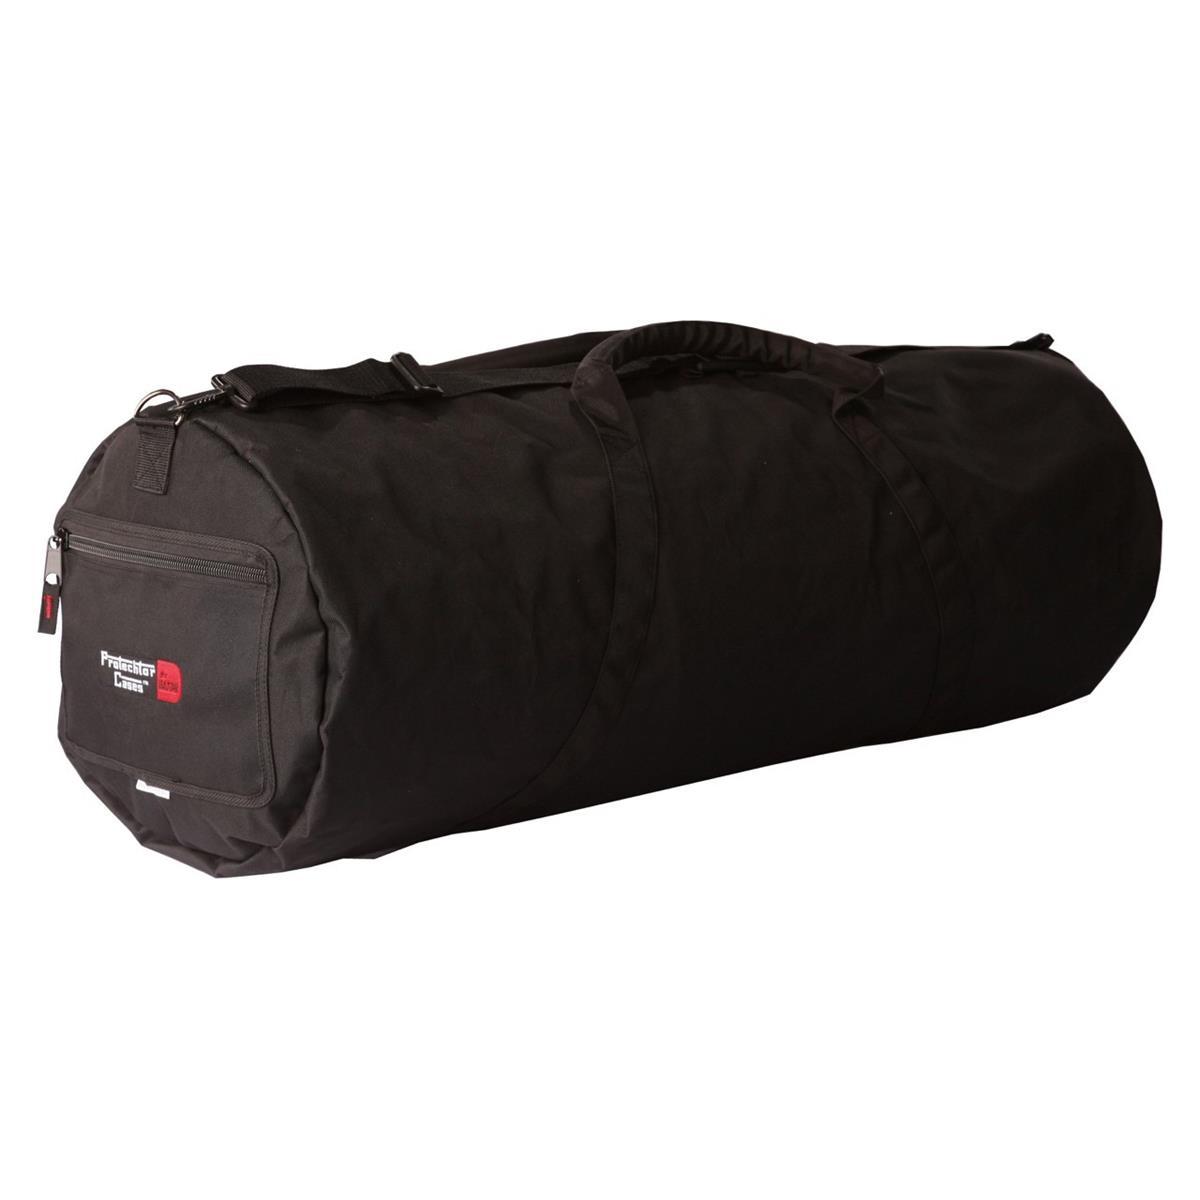 Gator GP-HDWE-1350 - borsa per hardware batteria 13 x 50 - Batterie / Percussioni Accessori - Custodie Per Batteria